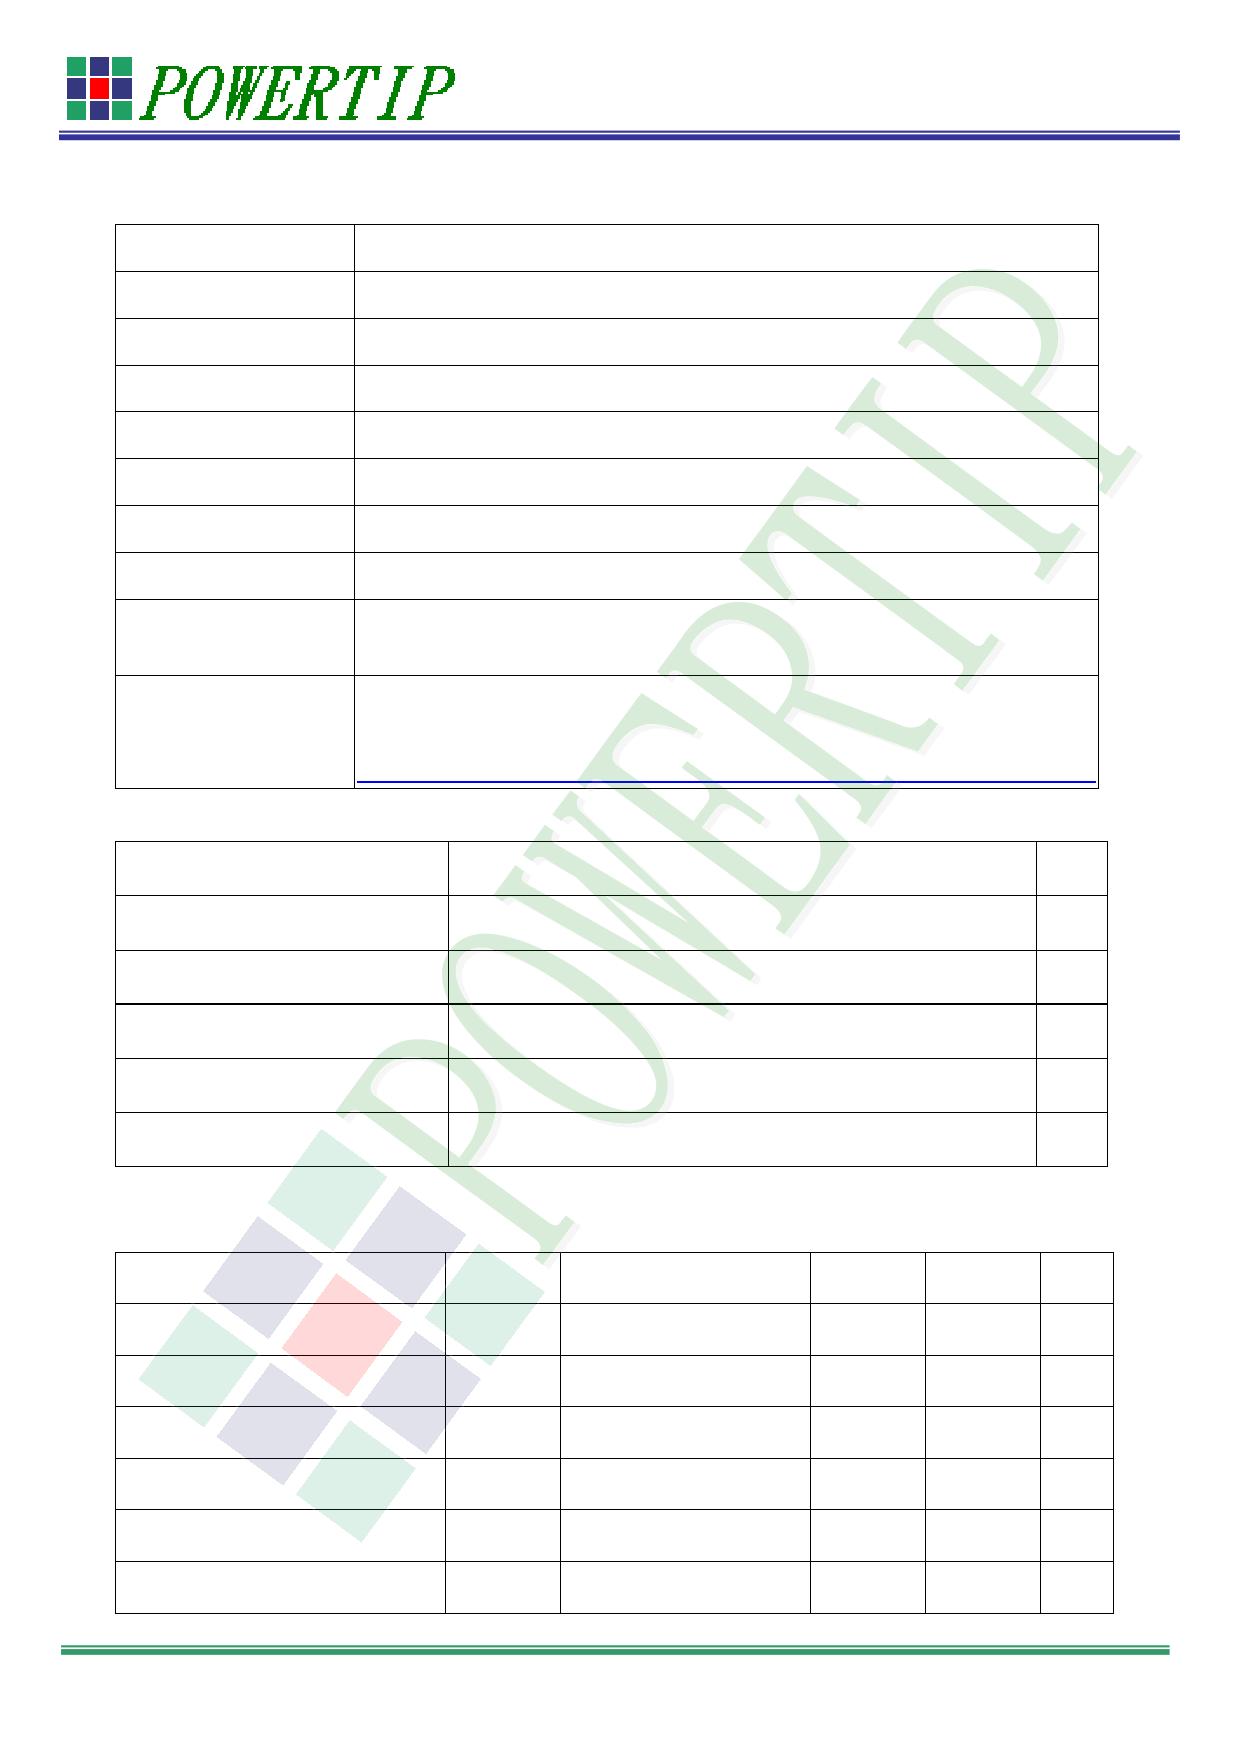 PG320240WRMDBAI30Q pdf, 반도체, 판매, 대치품